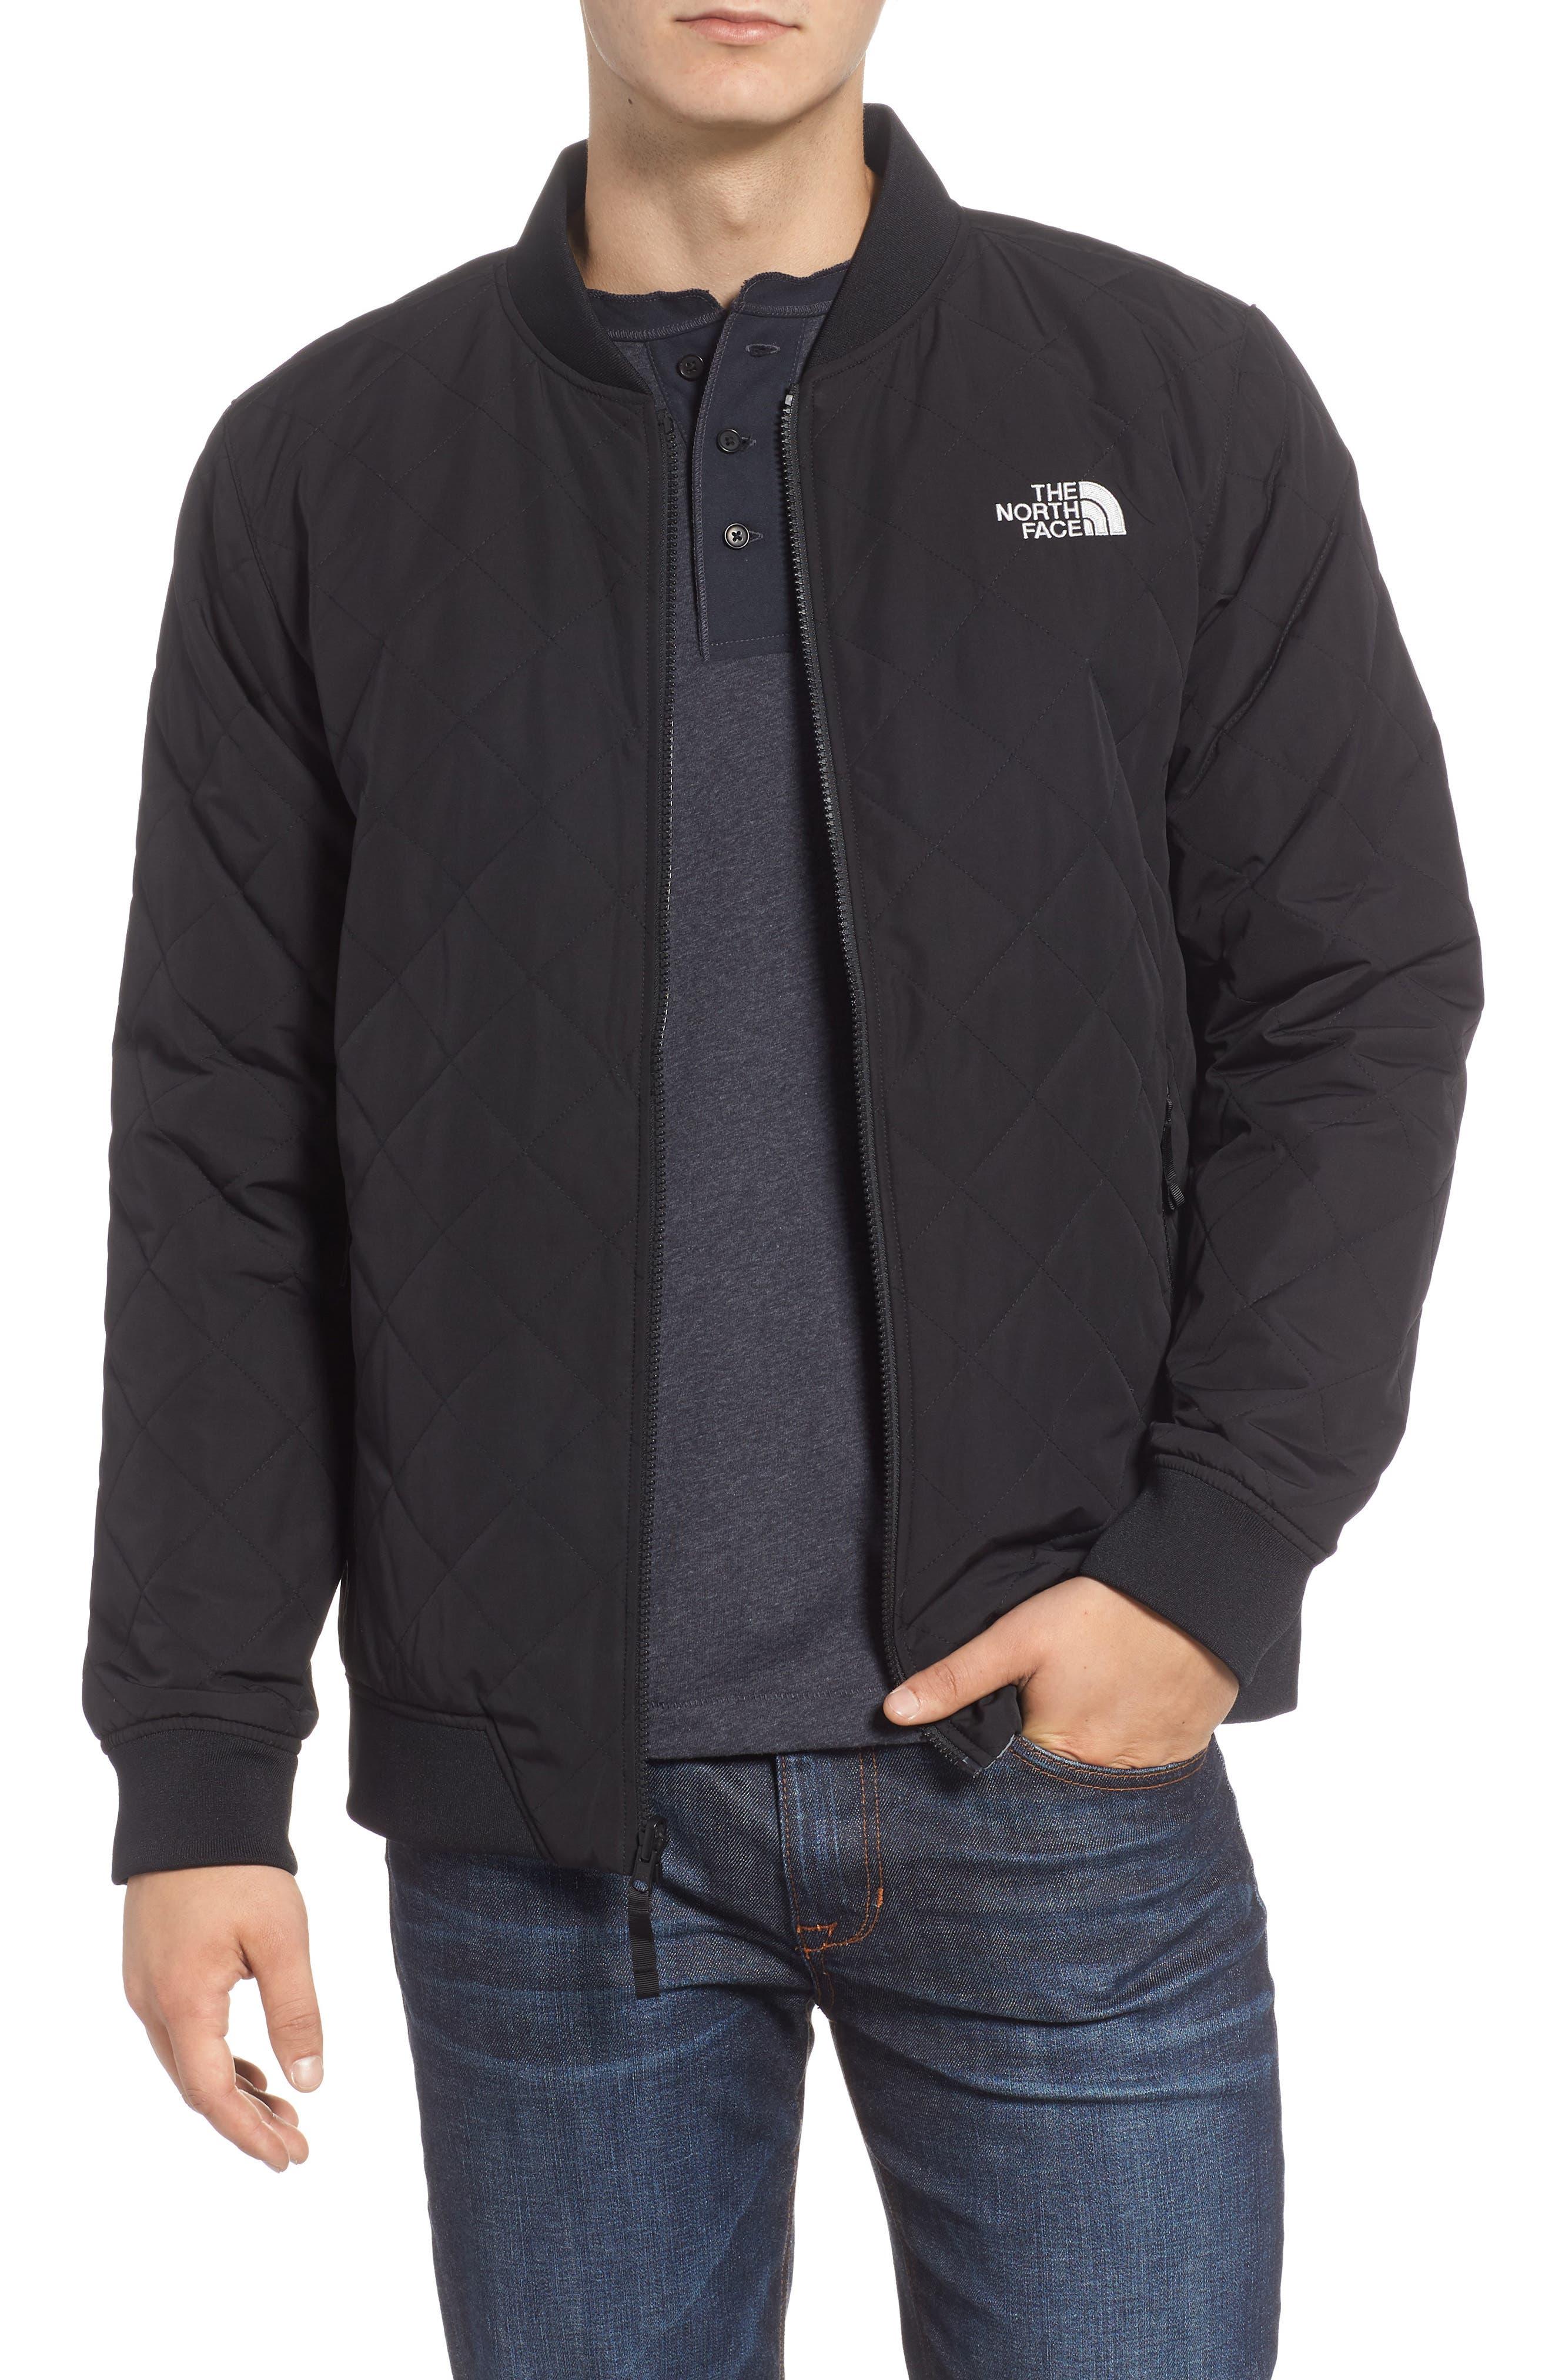 7b5445594 best a north face jacket 06d21 8b015